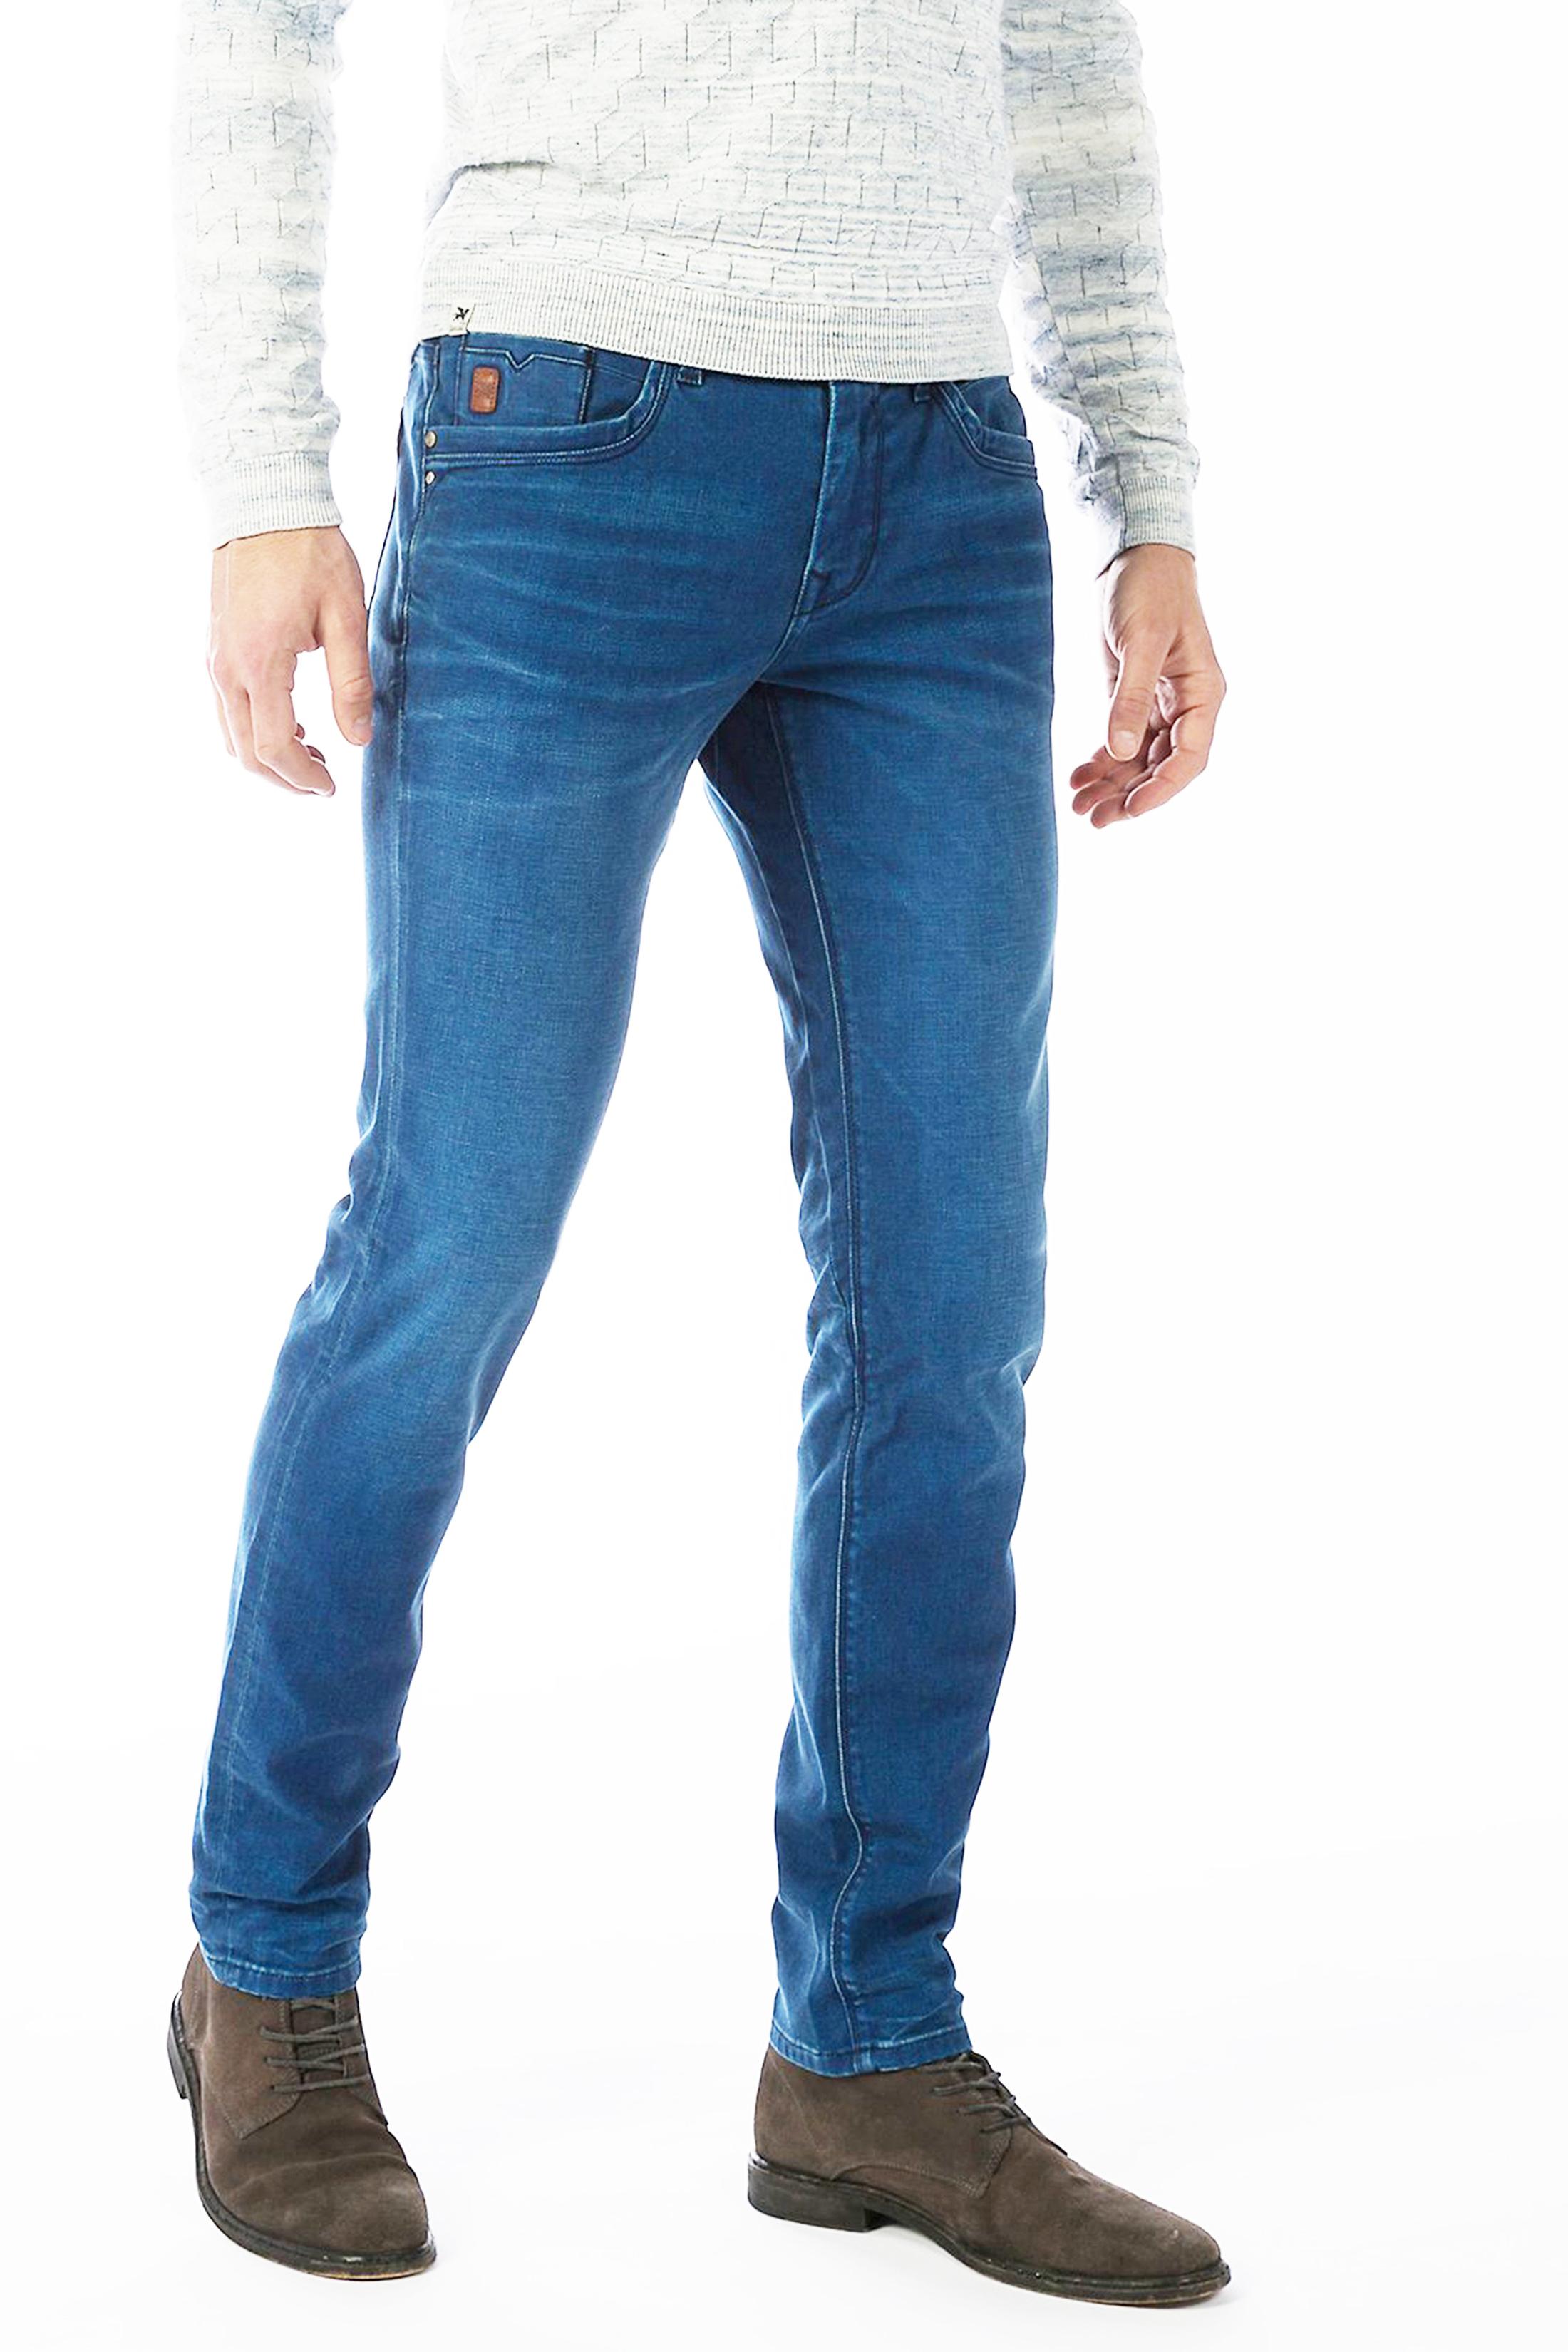 Vanguard V8 Jeans Blau foto 5